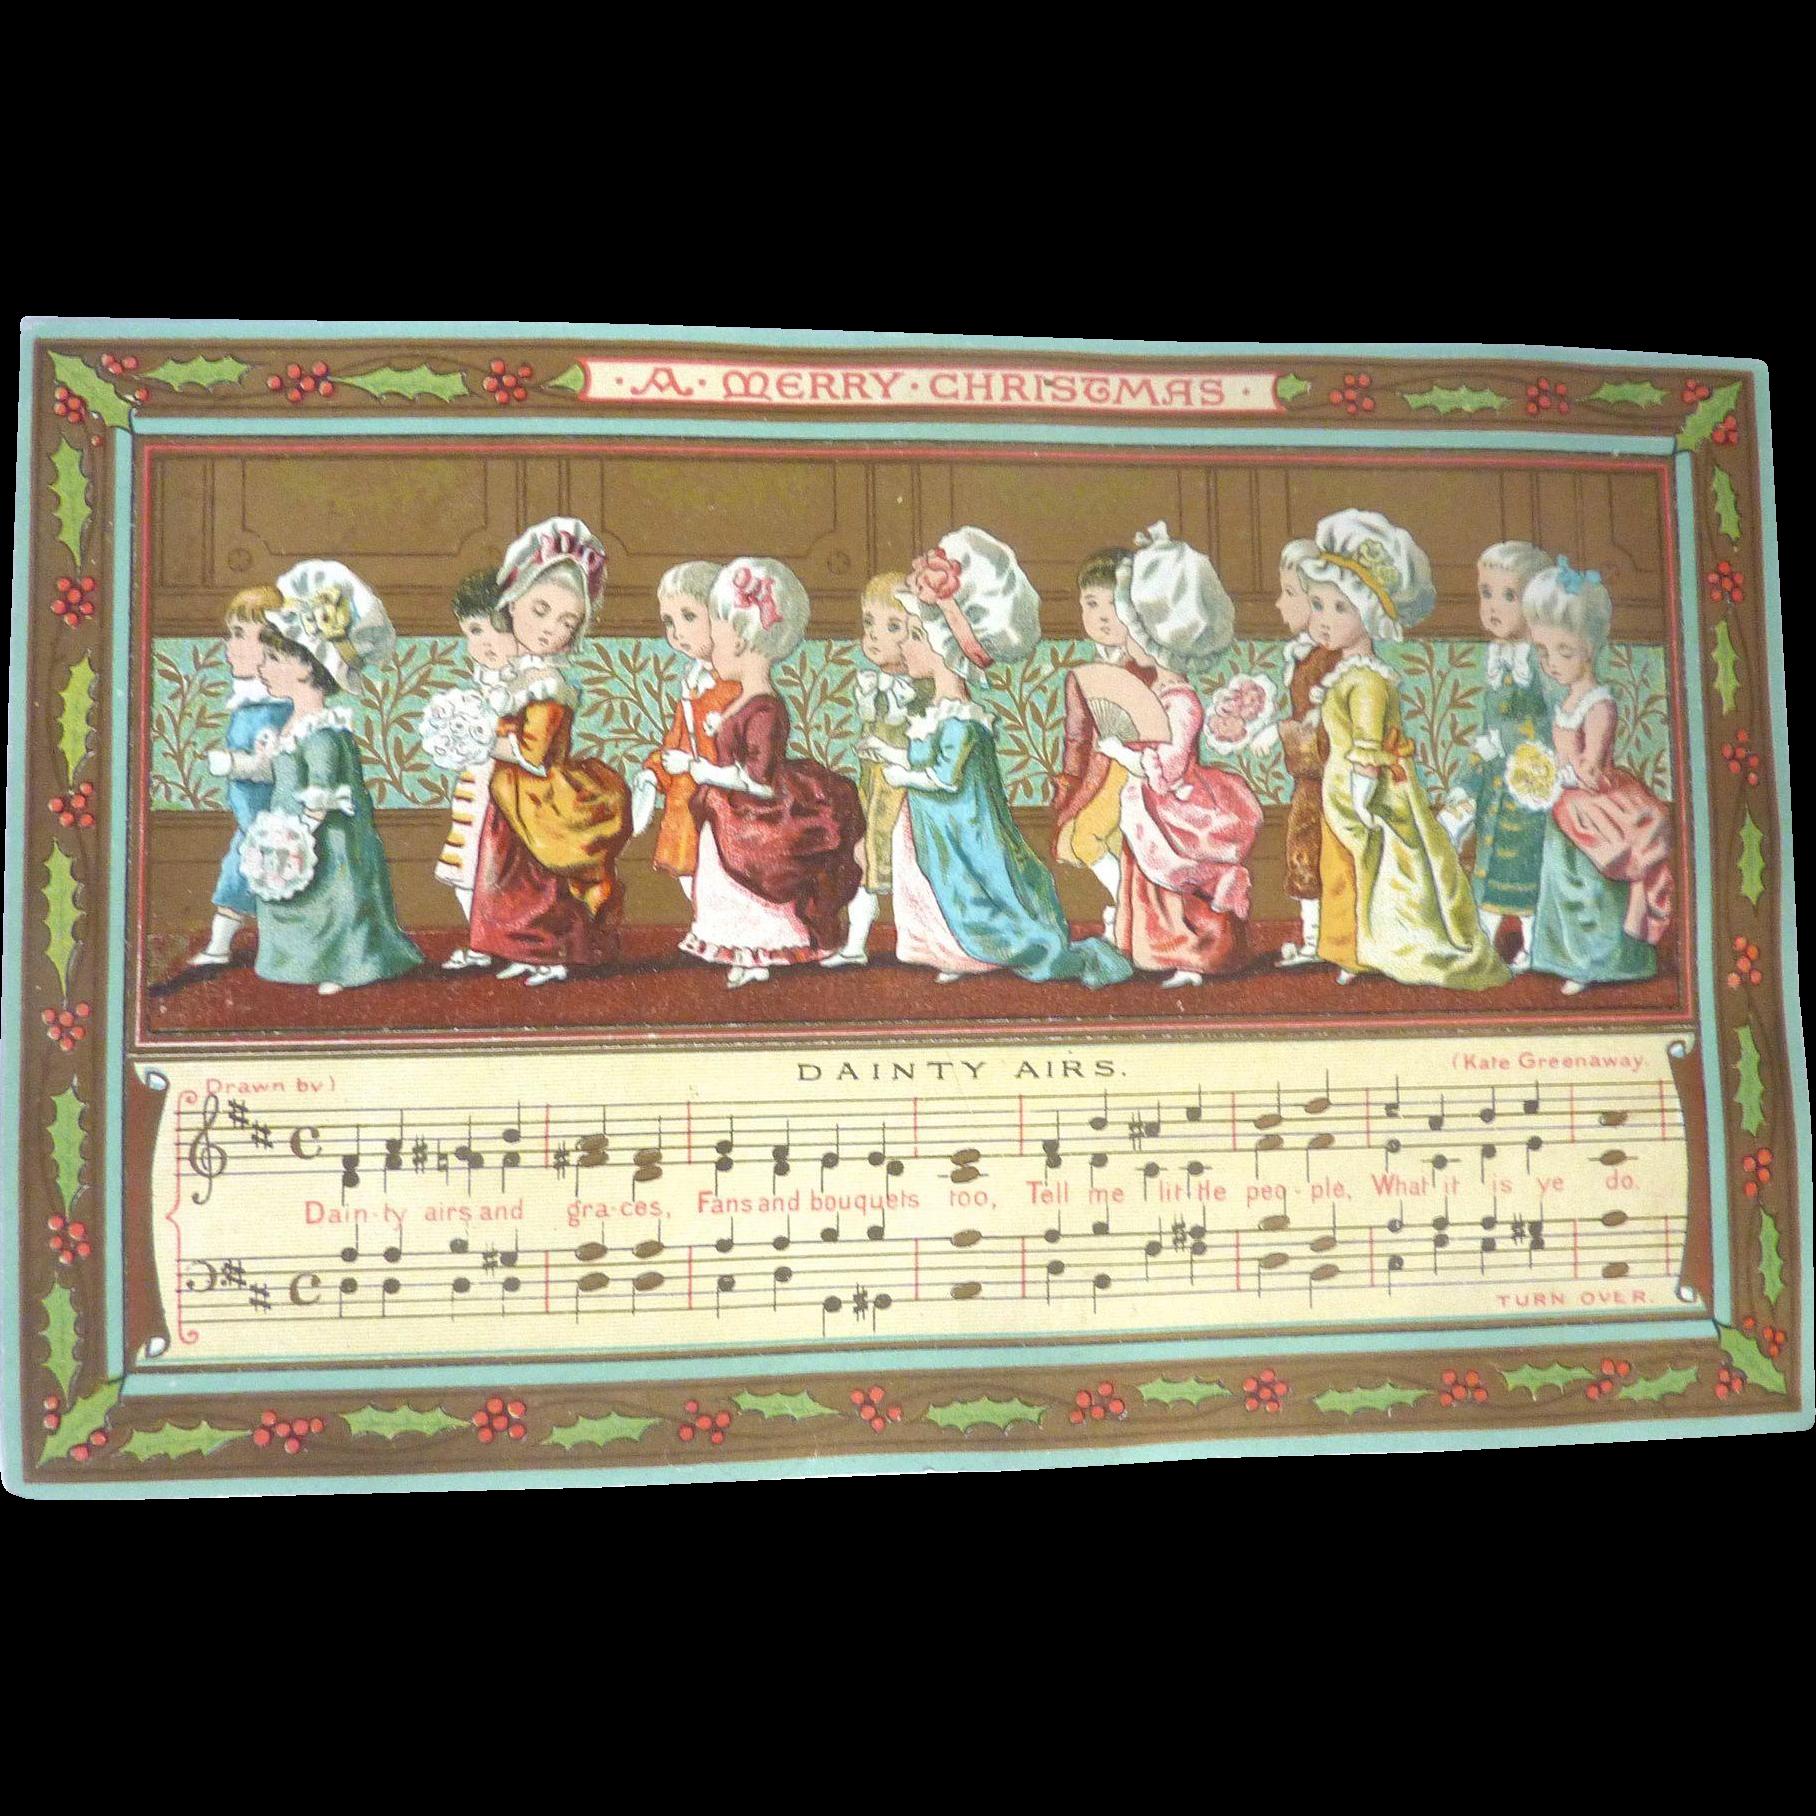 Rare KATE GREENAWAY 1883 'A Merry Christmas' Dainty Airs MARCUS WARD Greeting Card